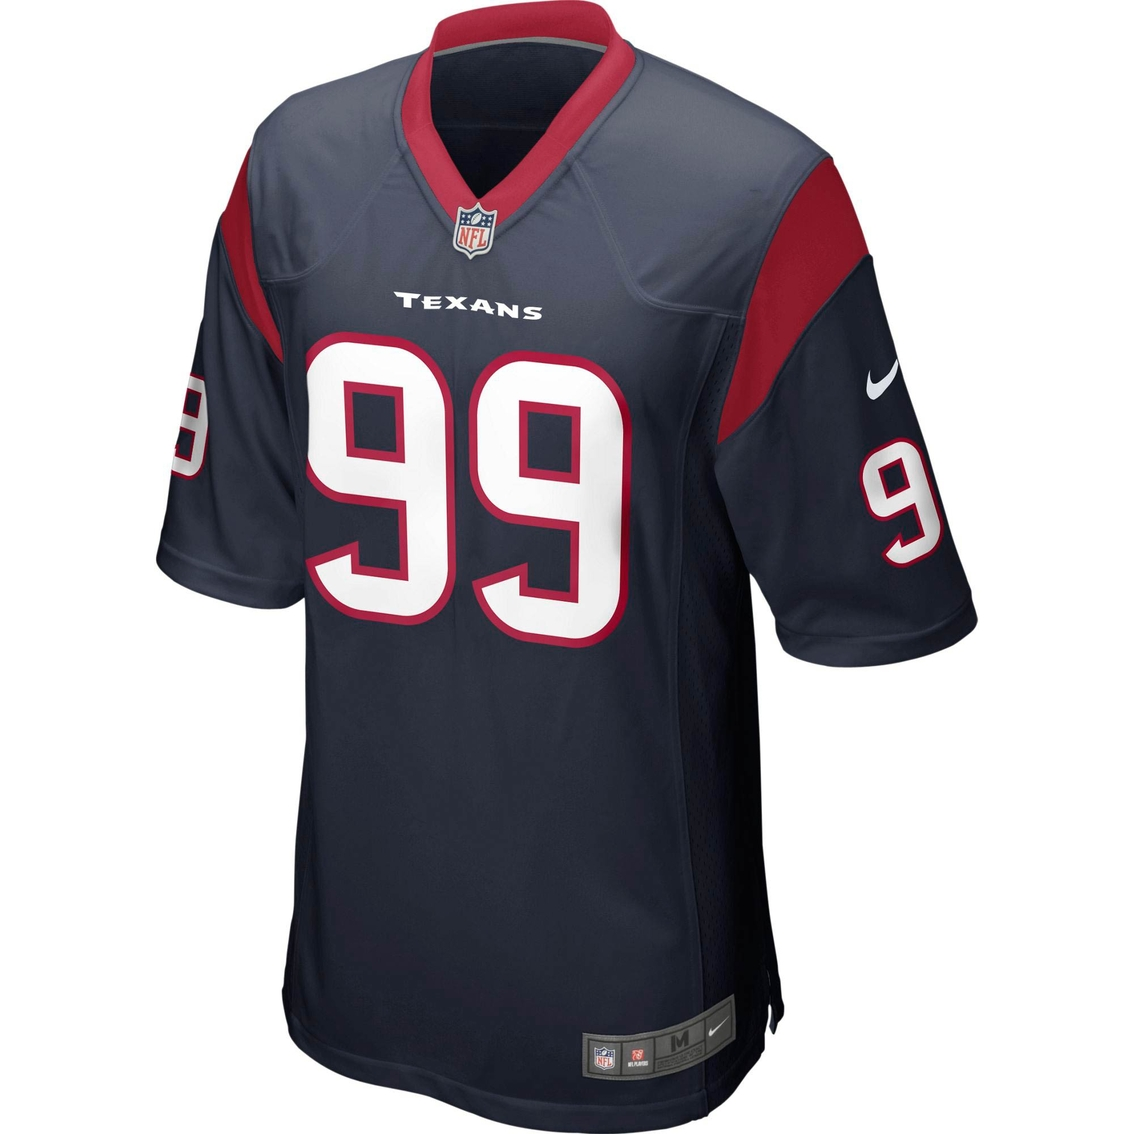 93ae40aa8c9dcc Nike Nfl Houston Texans Men's Watt Game Jersey | Jerseys | Sports ...